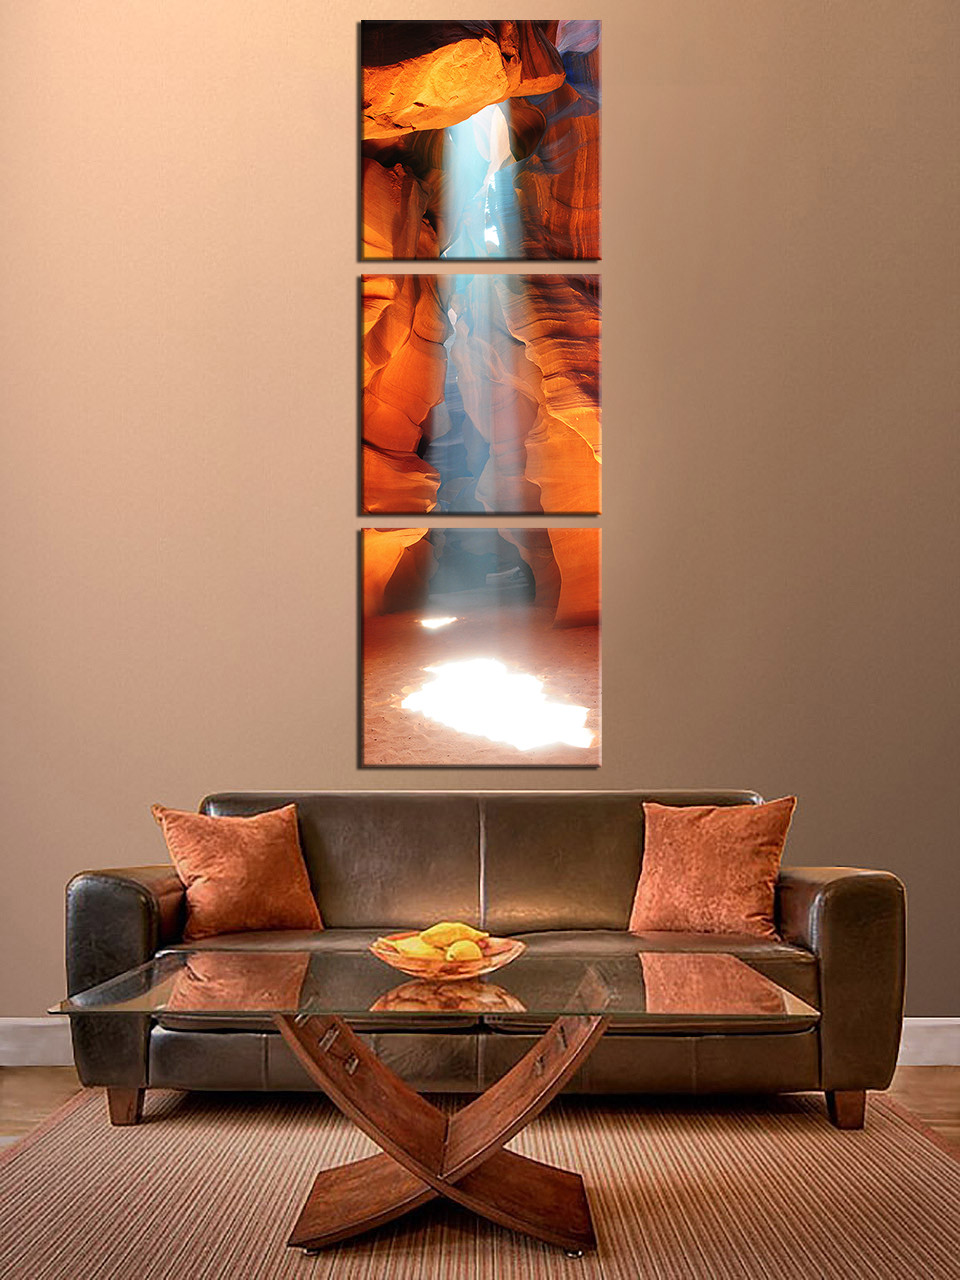 3 Piece Canvas Photography, Landscape Sunshine Large Pictures, Sunlight  Shining Mountain Sand Cave Multi Panel Art, Orange Canvas Wall Art Part 94